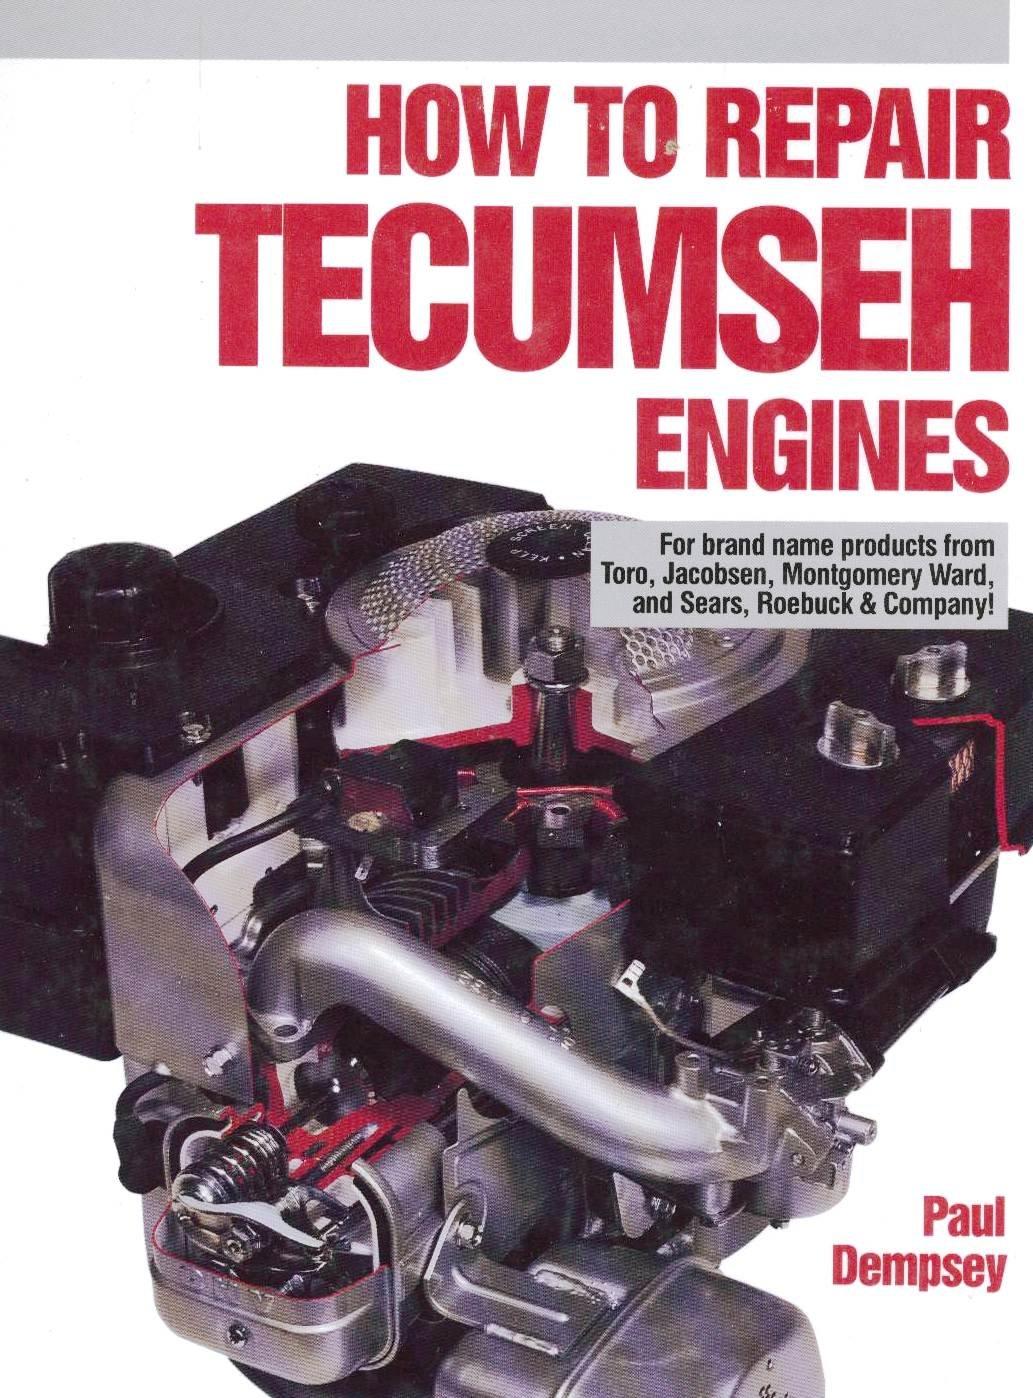 How to Repair Tecumseh Engines: Paul Dempsey: 9780830683574